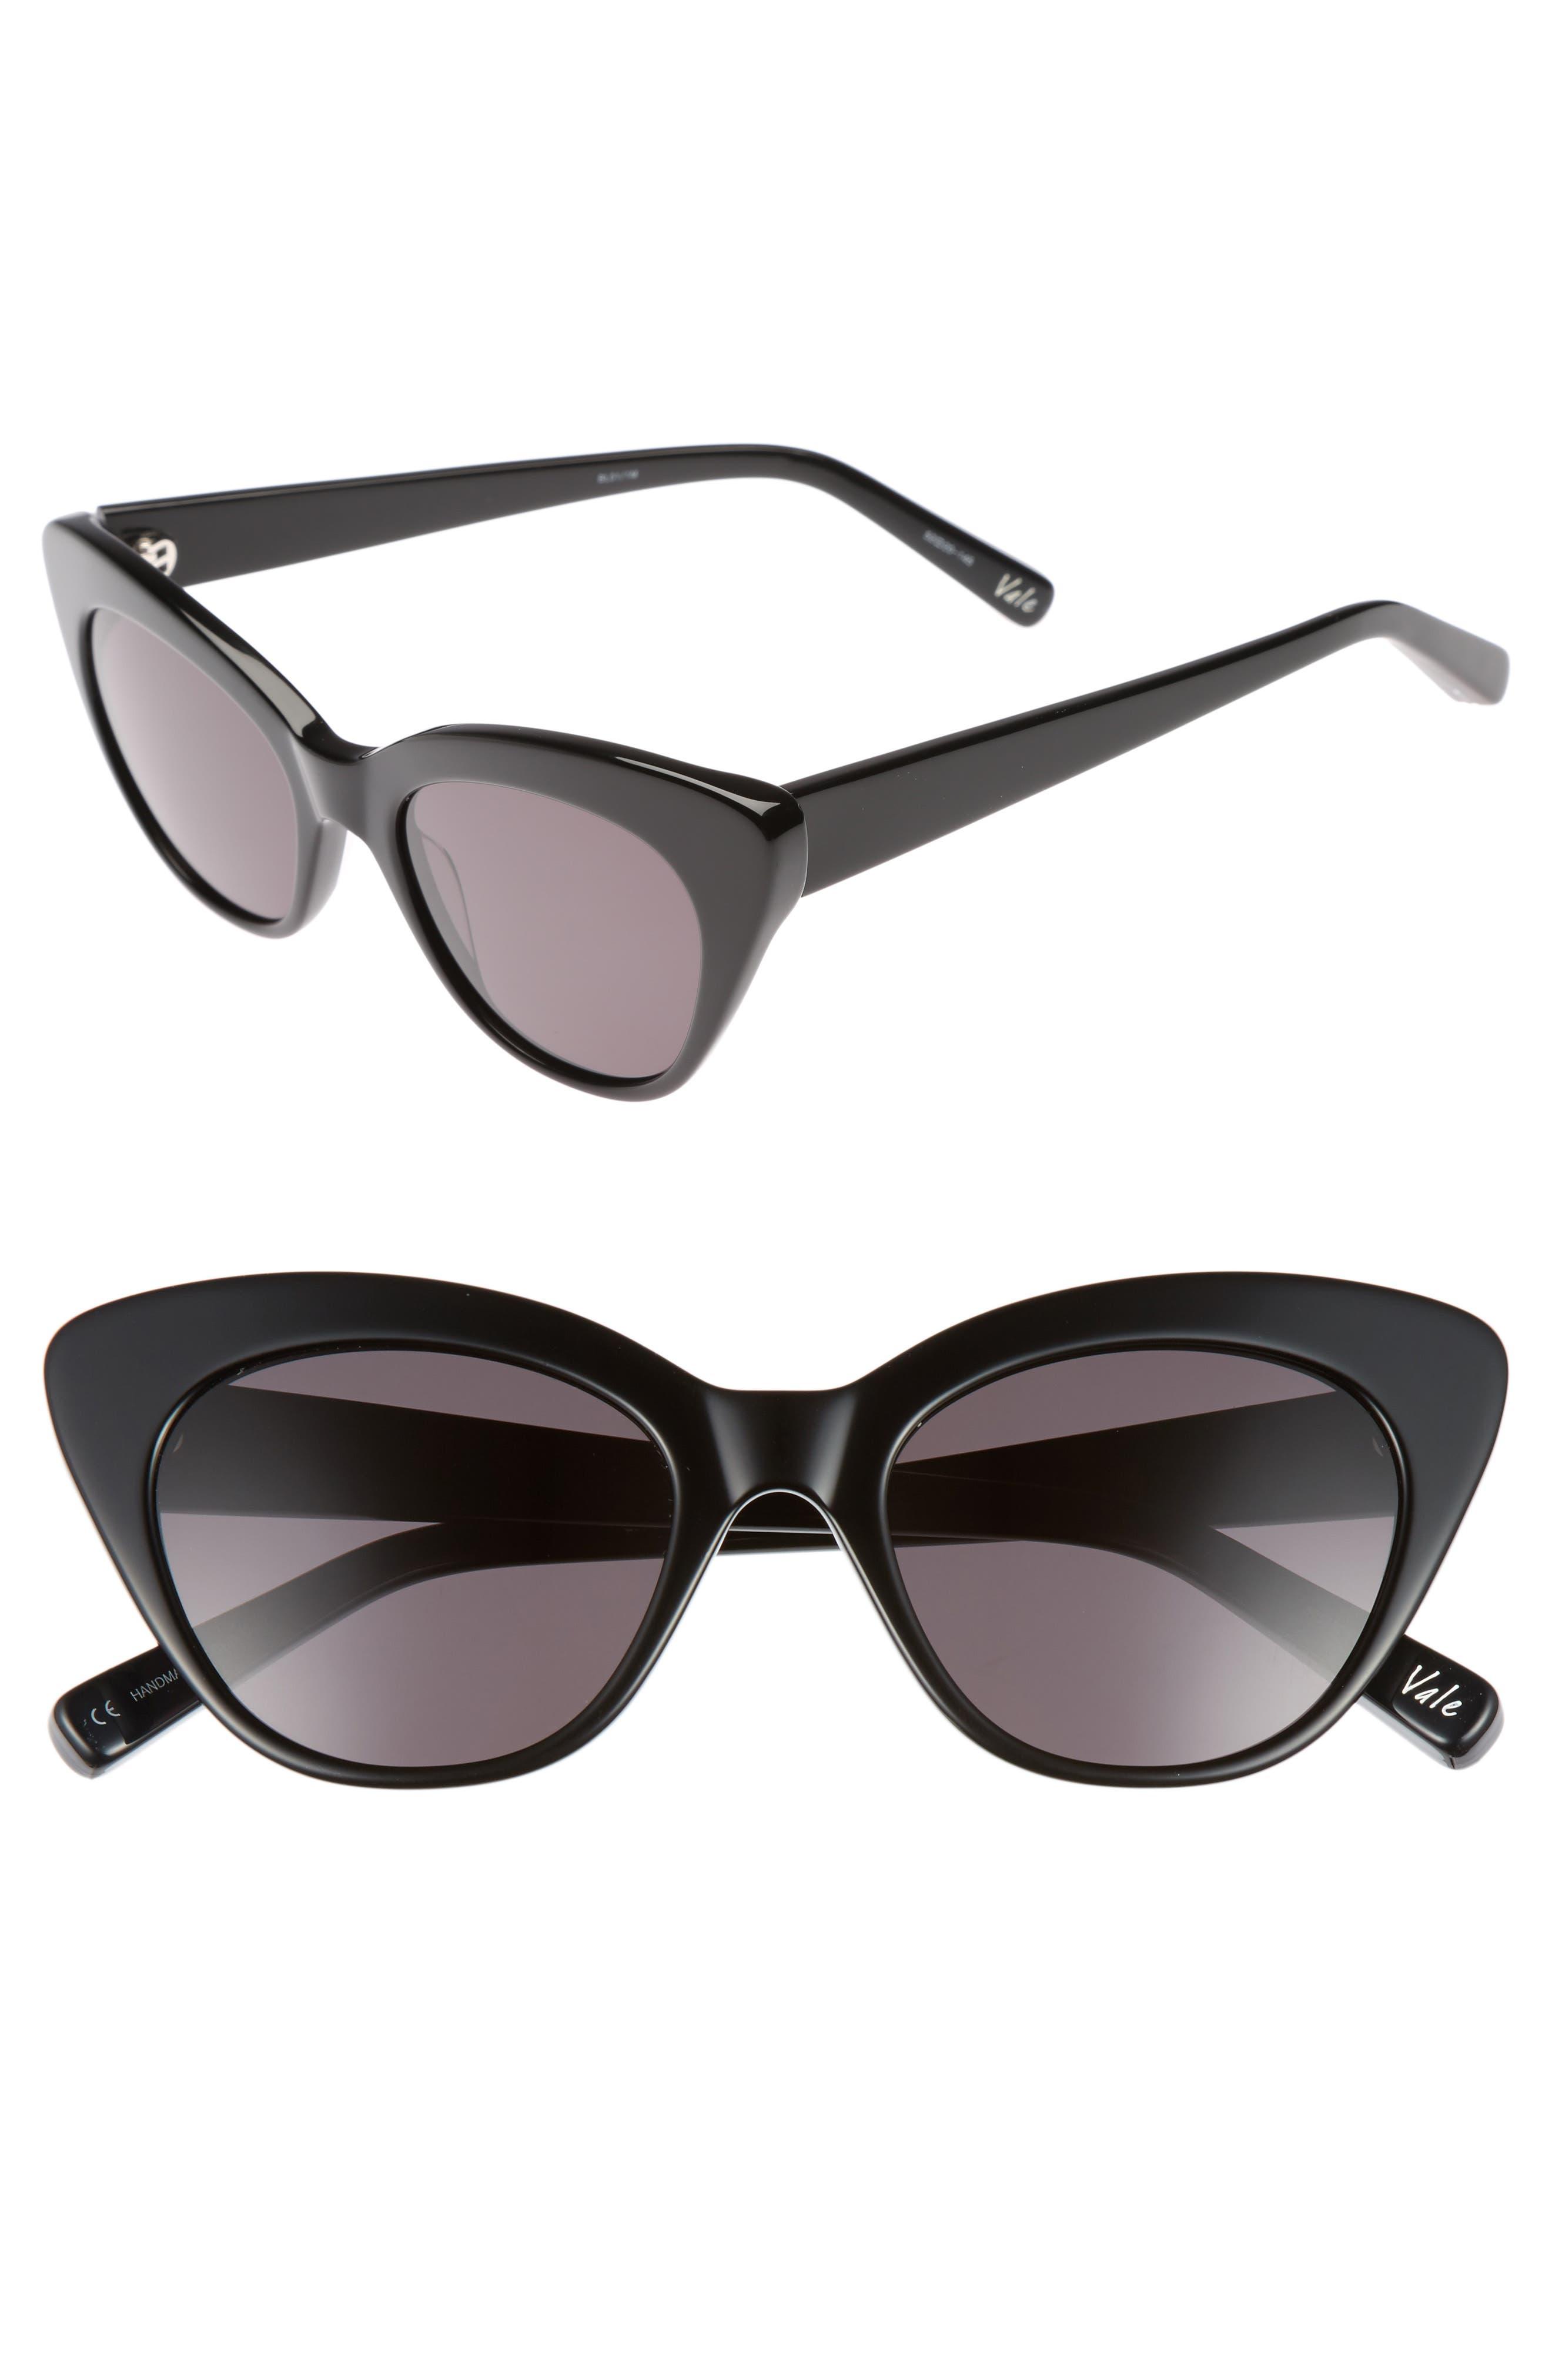 ELIZABETH AND JAMES, Vale 52mm Cat Eye Sunglasses, Main thumbnail 1, color, 020